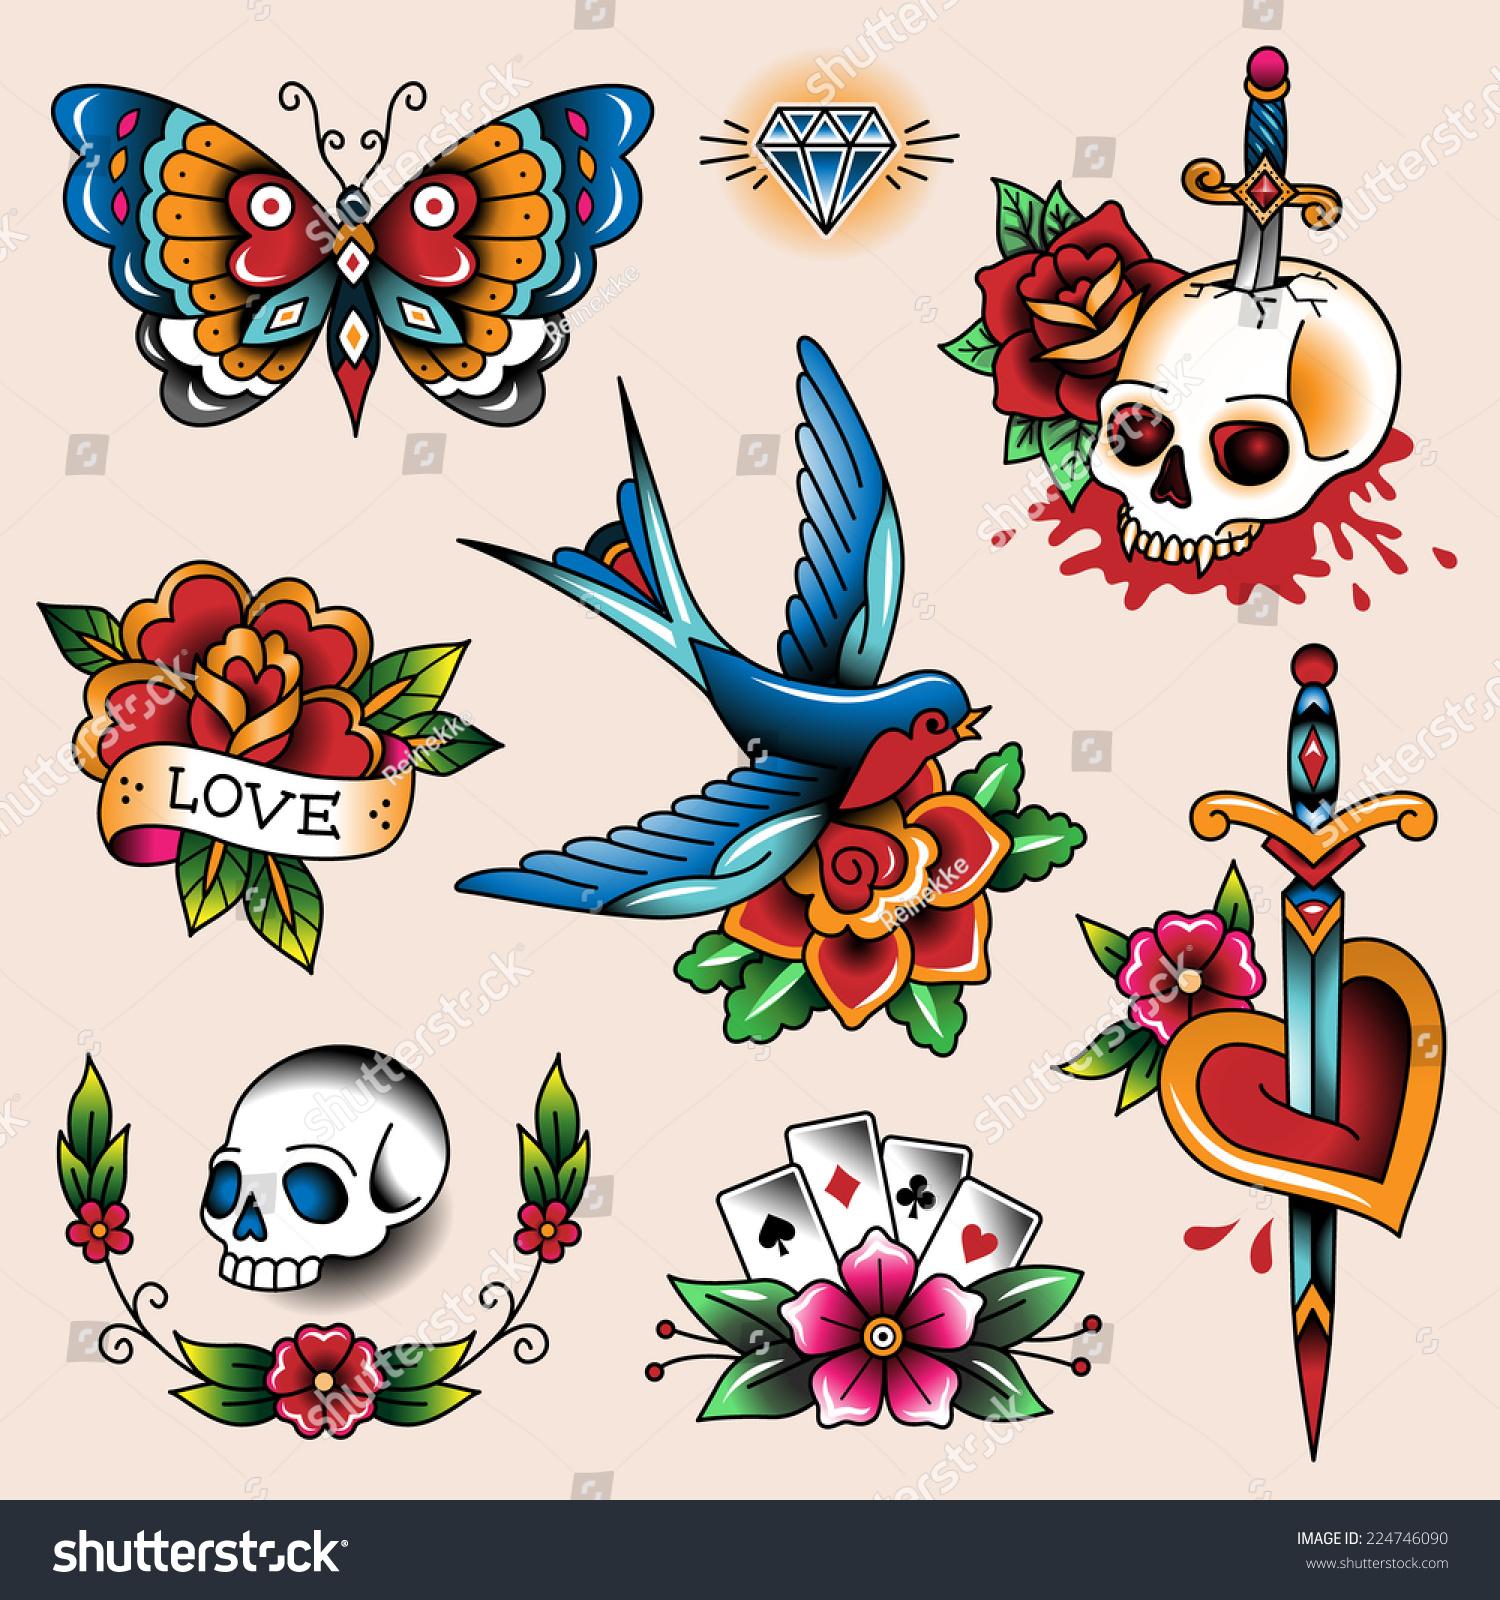 Tattoo Ideas Vintage: Set Color Vintage Tattoos Your Design Stock Vector